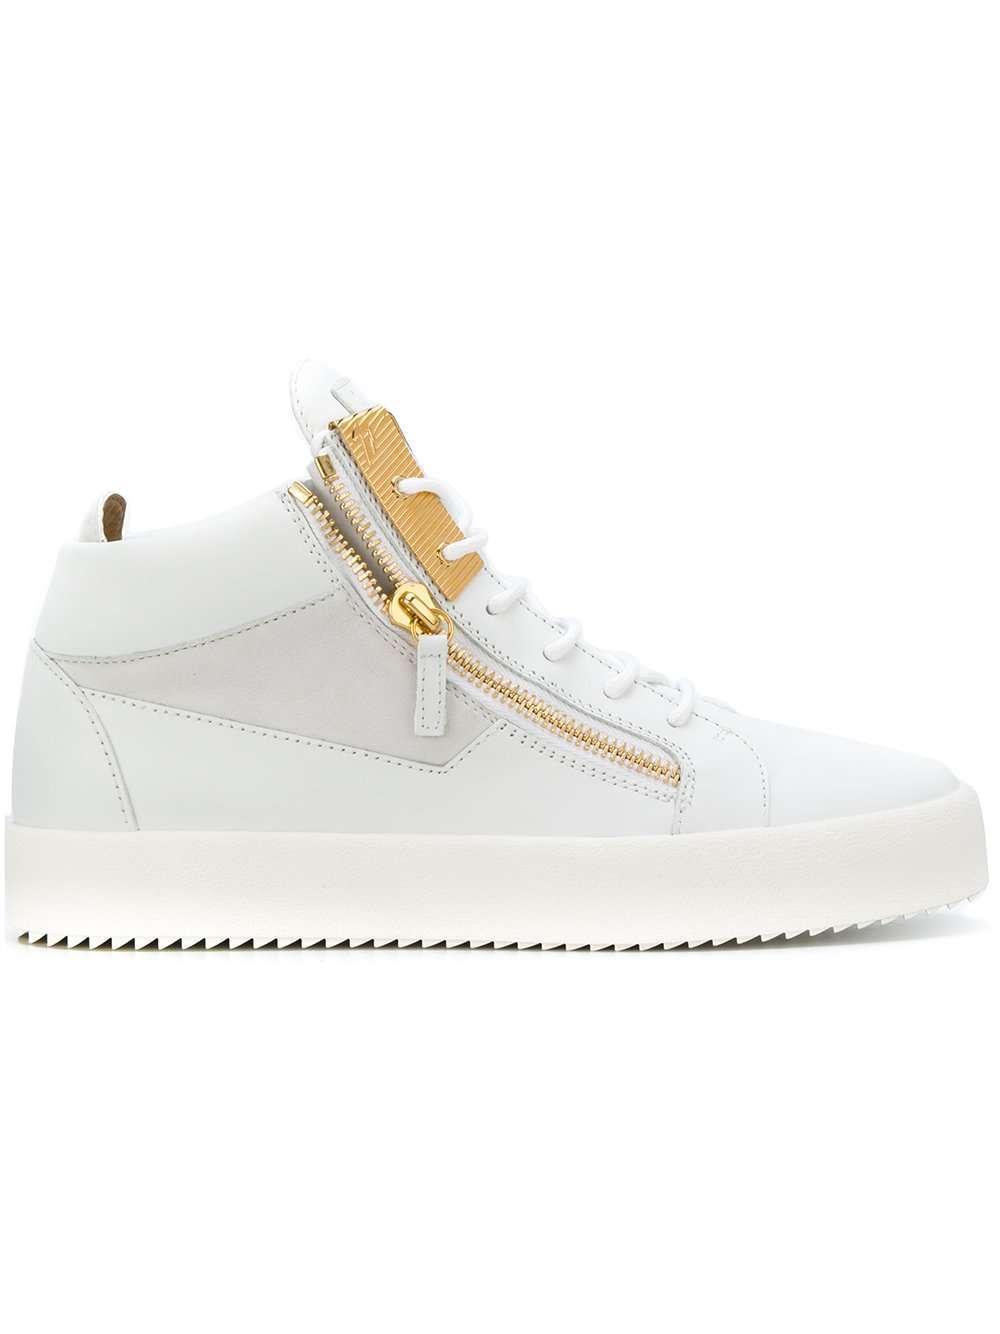 scarpe-da-ginnastica-in-pelle-giuseppe-zanotti